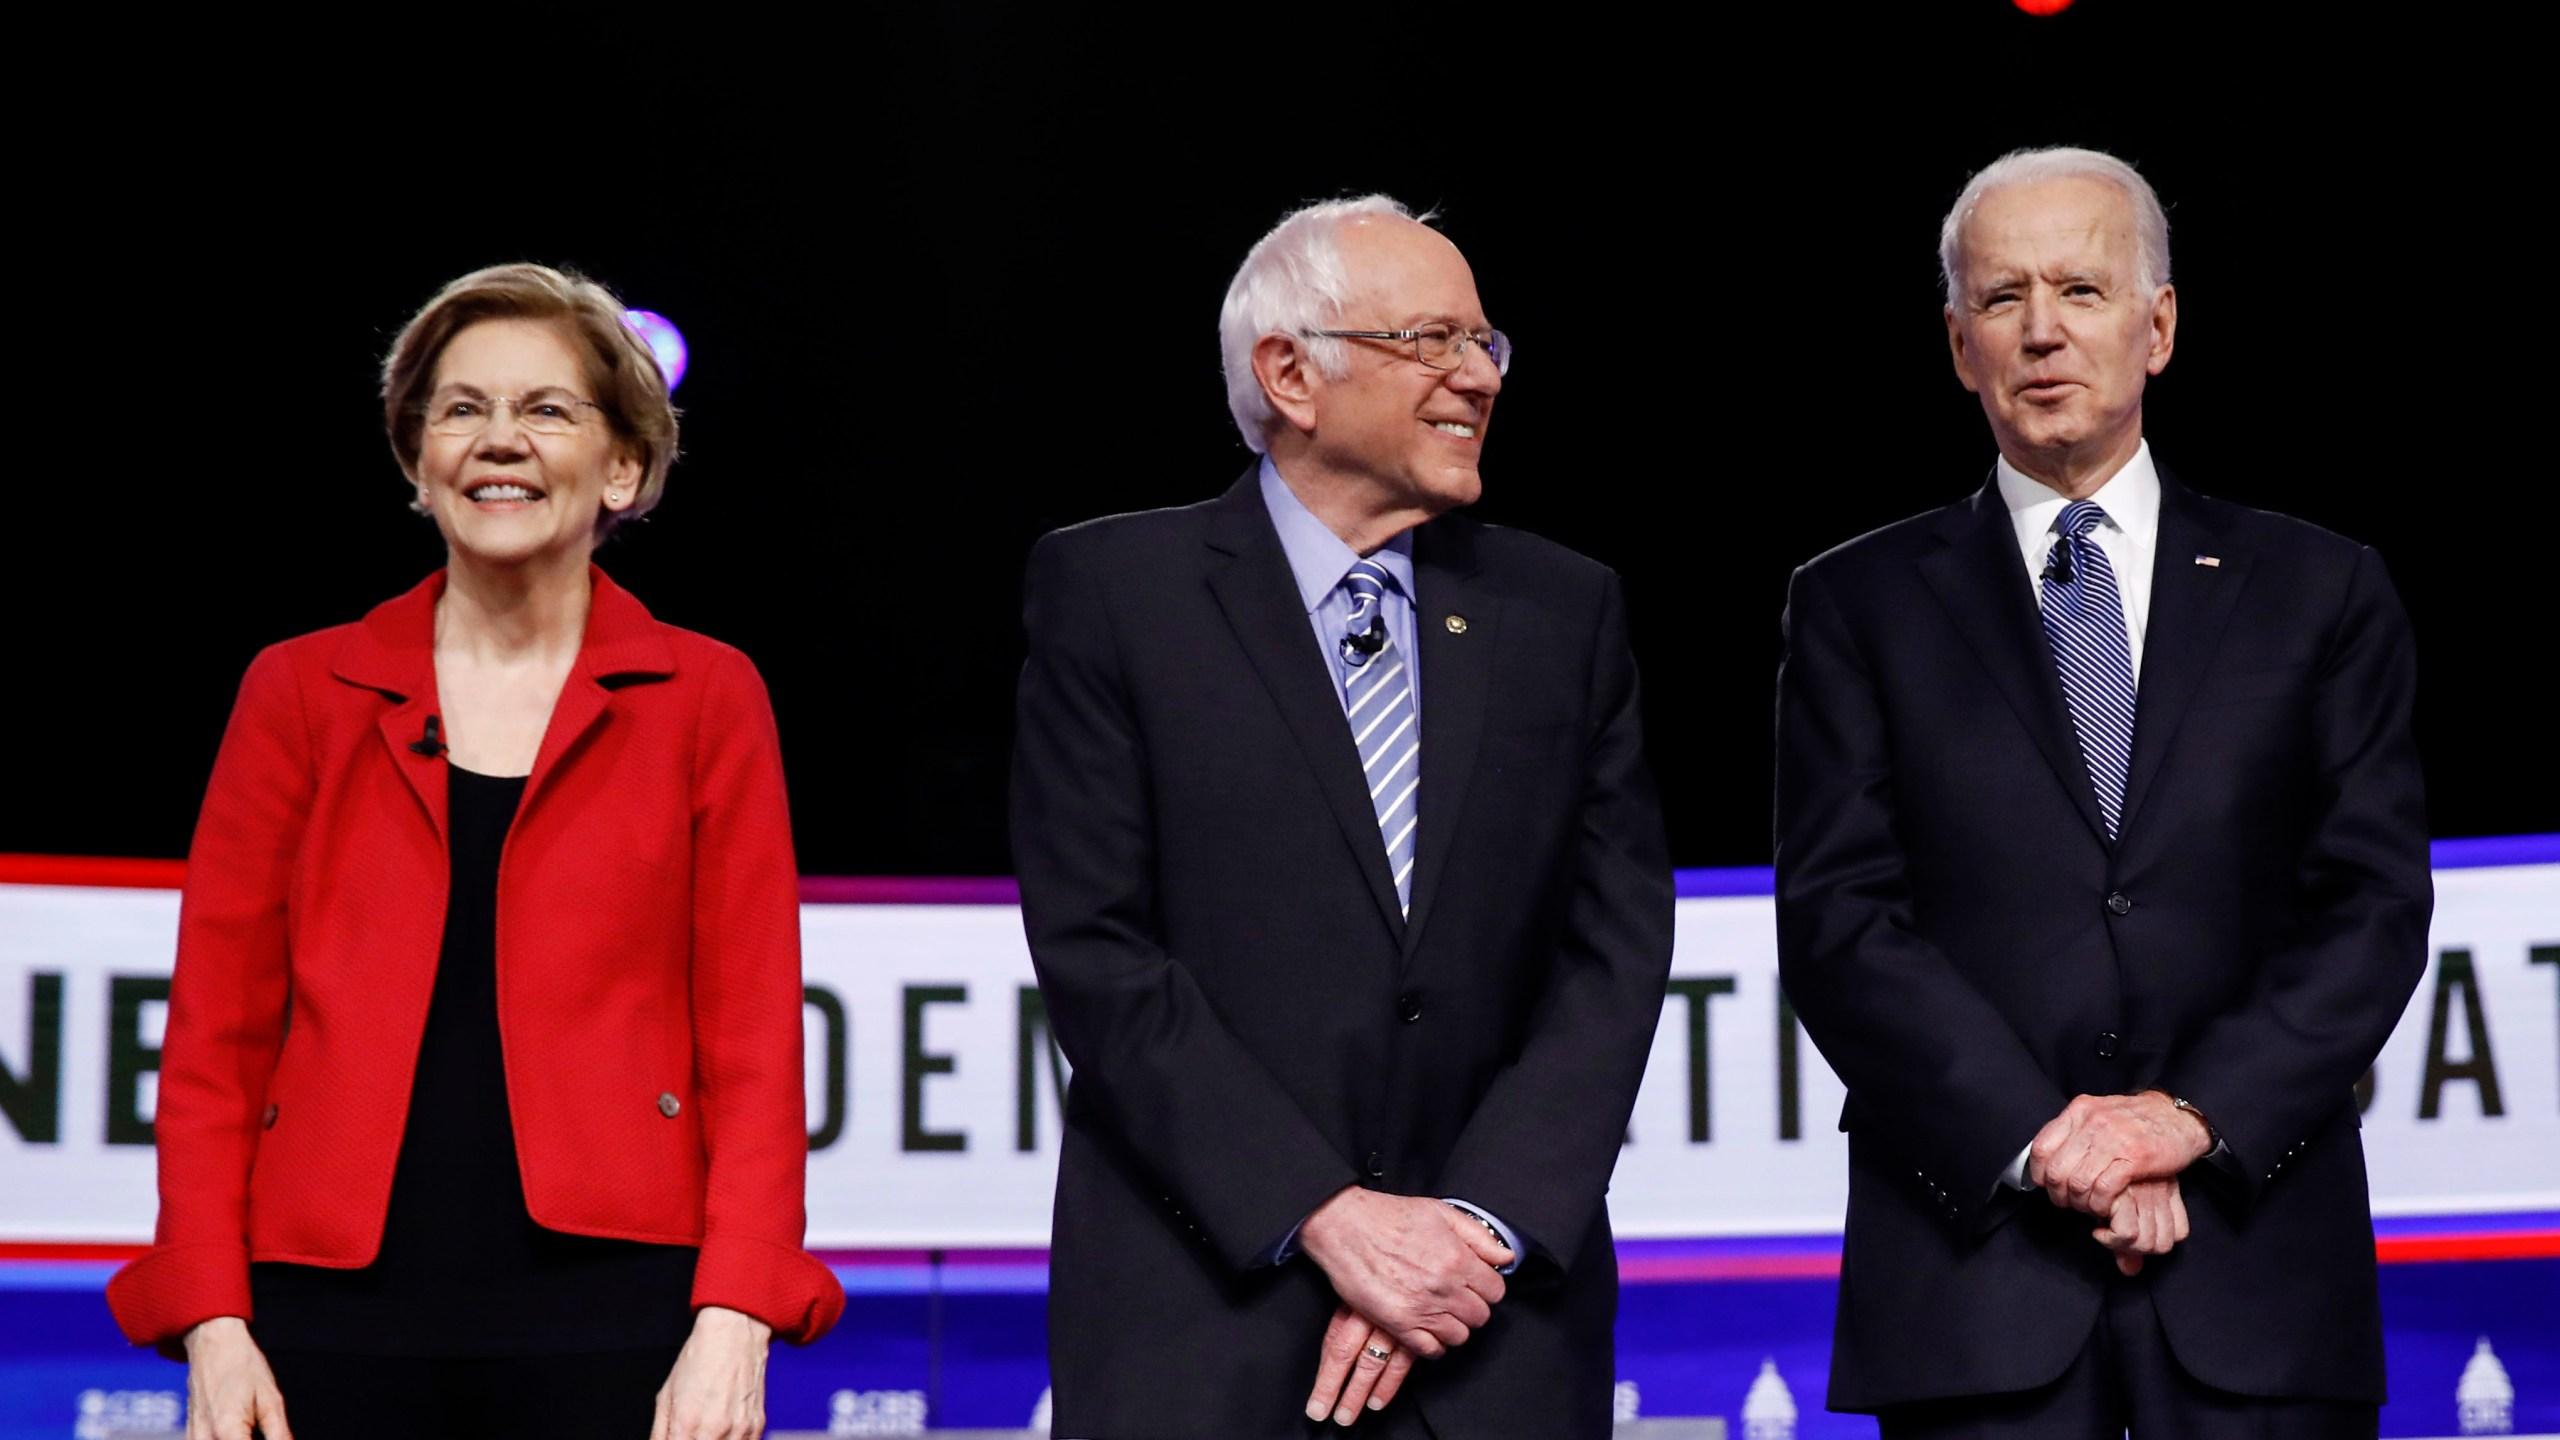 Elizabeth Warren, Bernie Sanders, Joe Biden, Amy Klobuchar